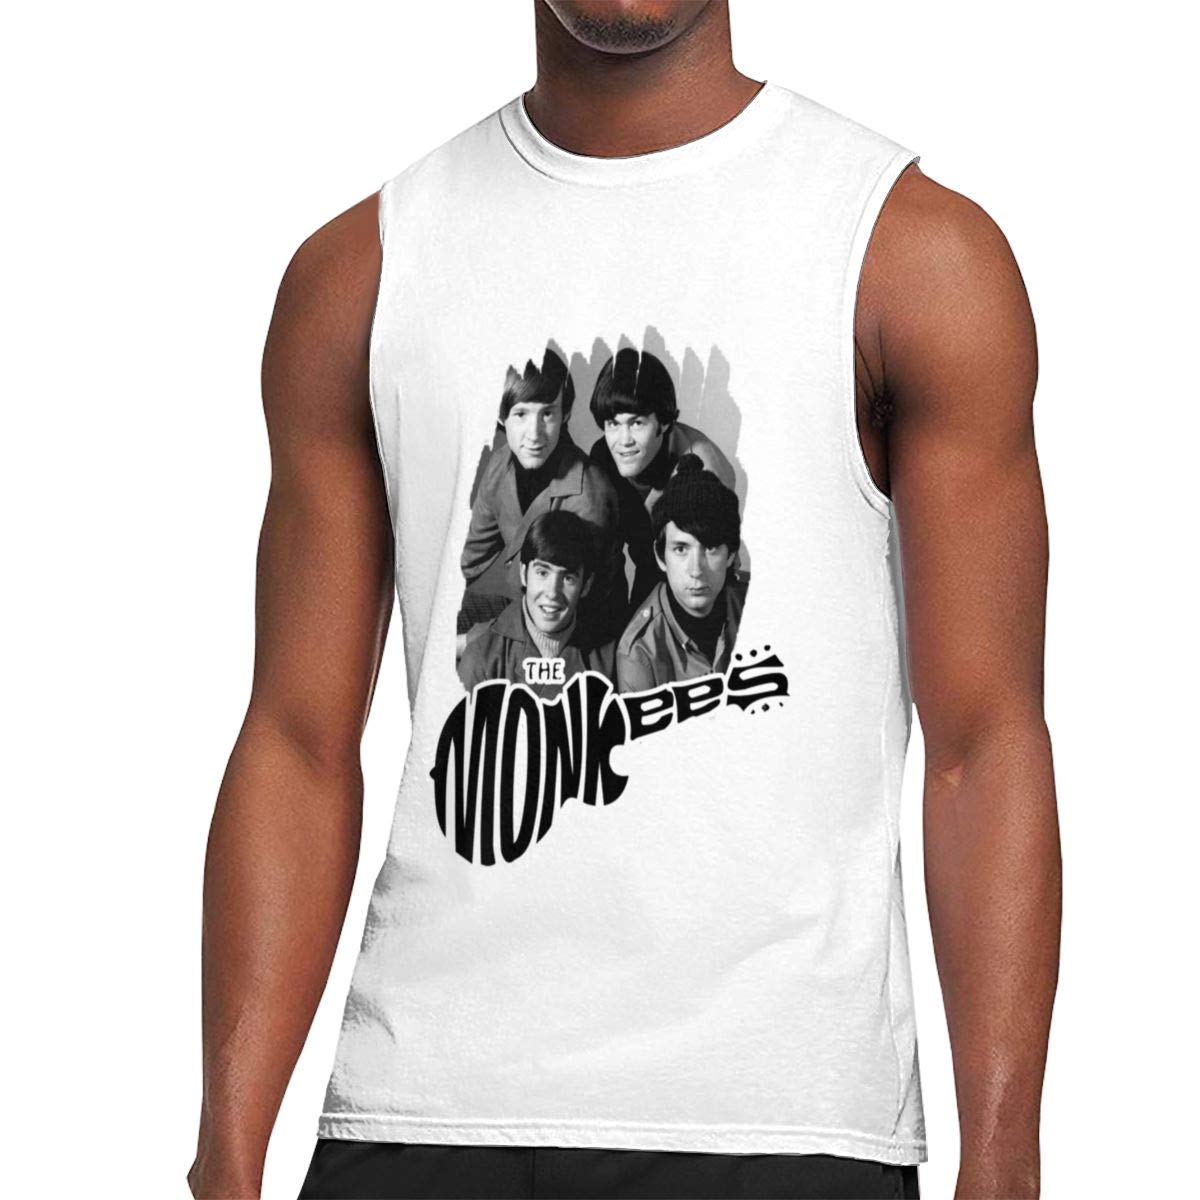 Seuriamin The Monkees S Fashion Hiking Sleeveless Muscle Short Sleeve T Shirt